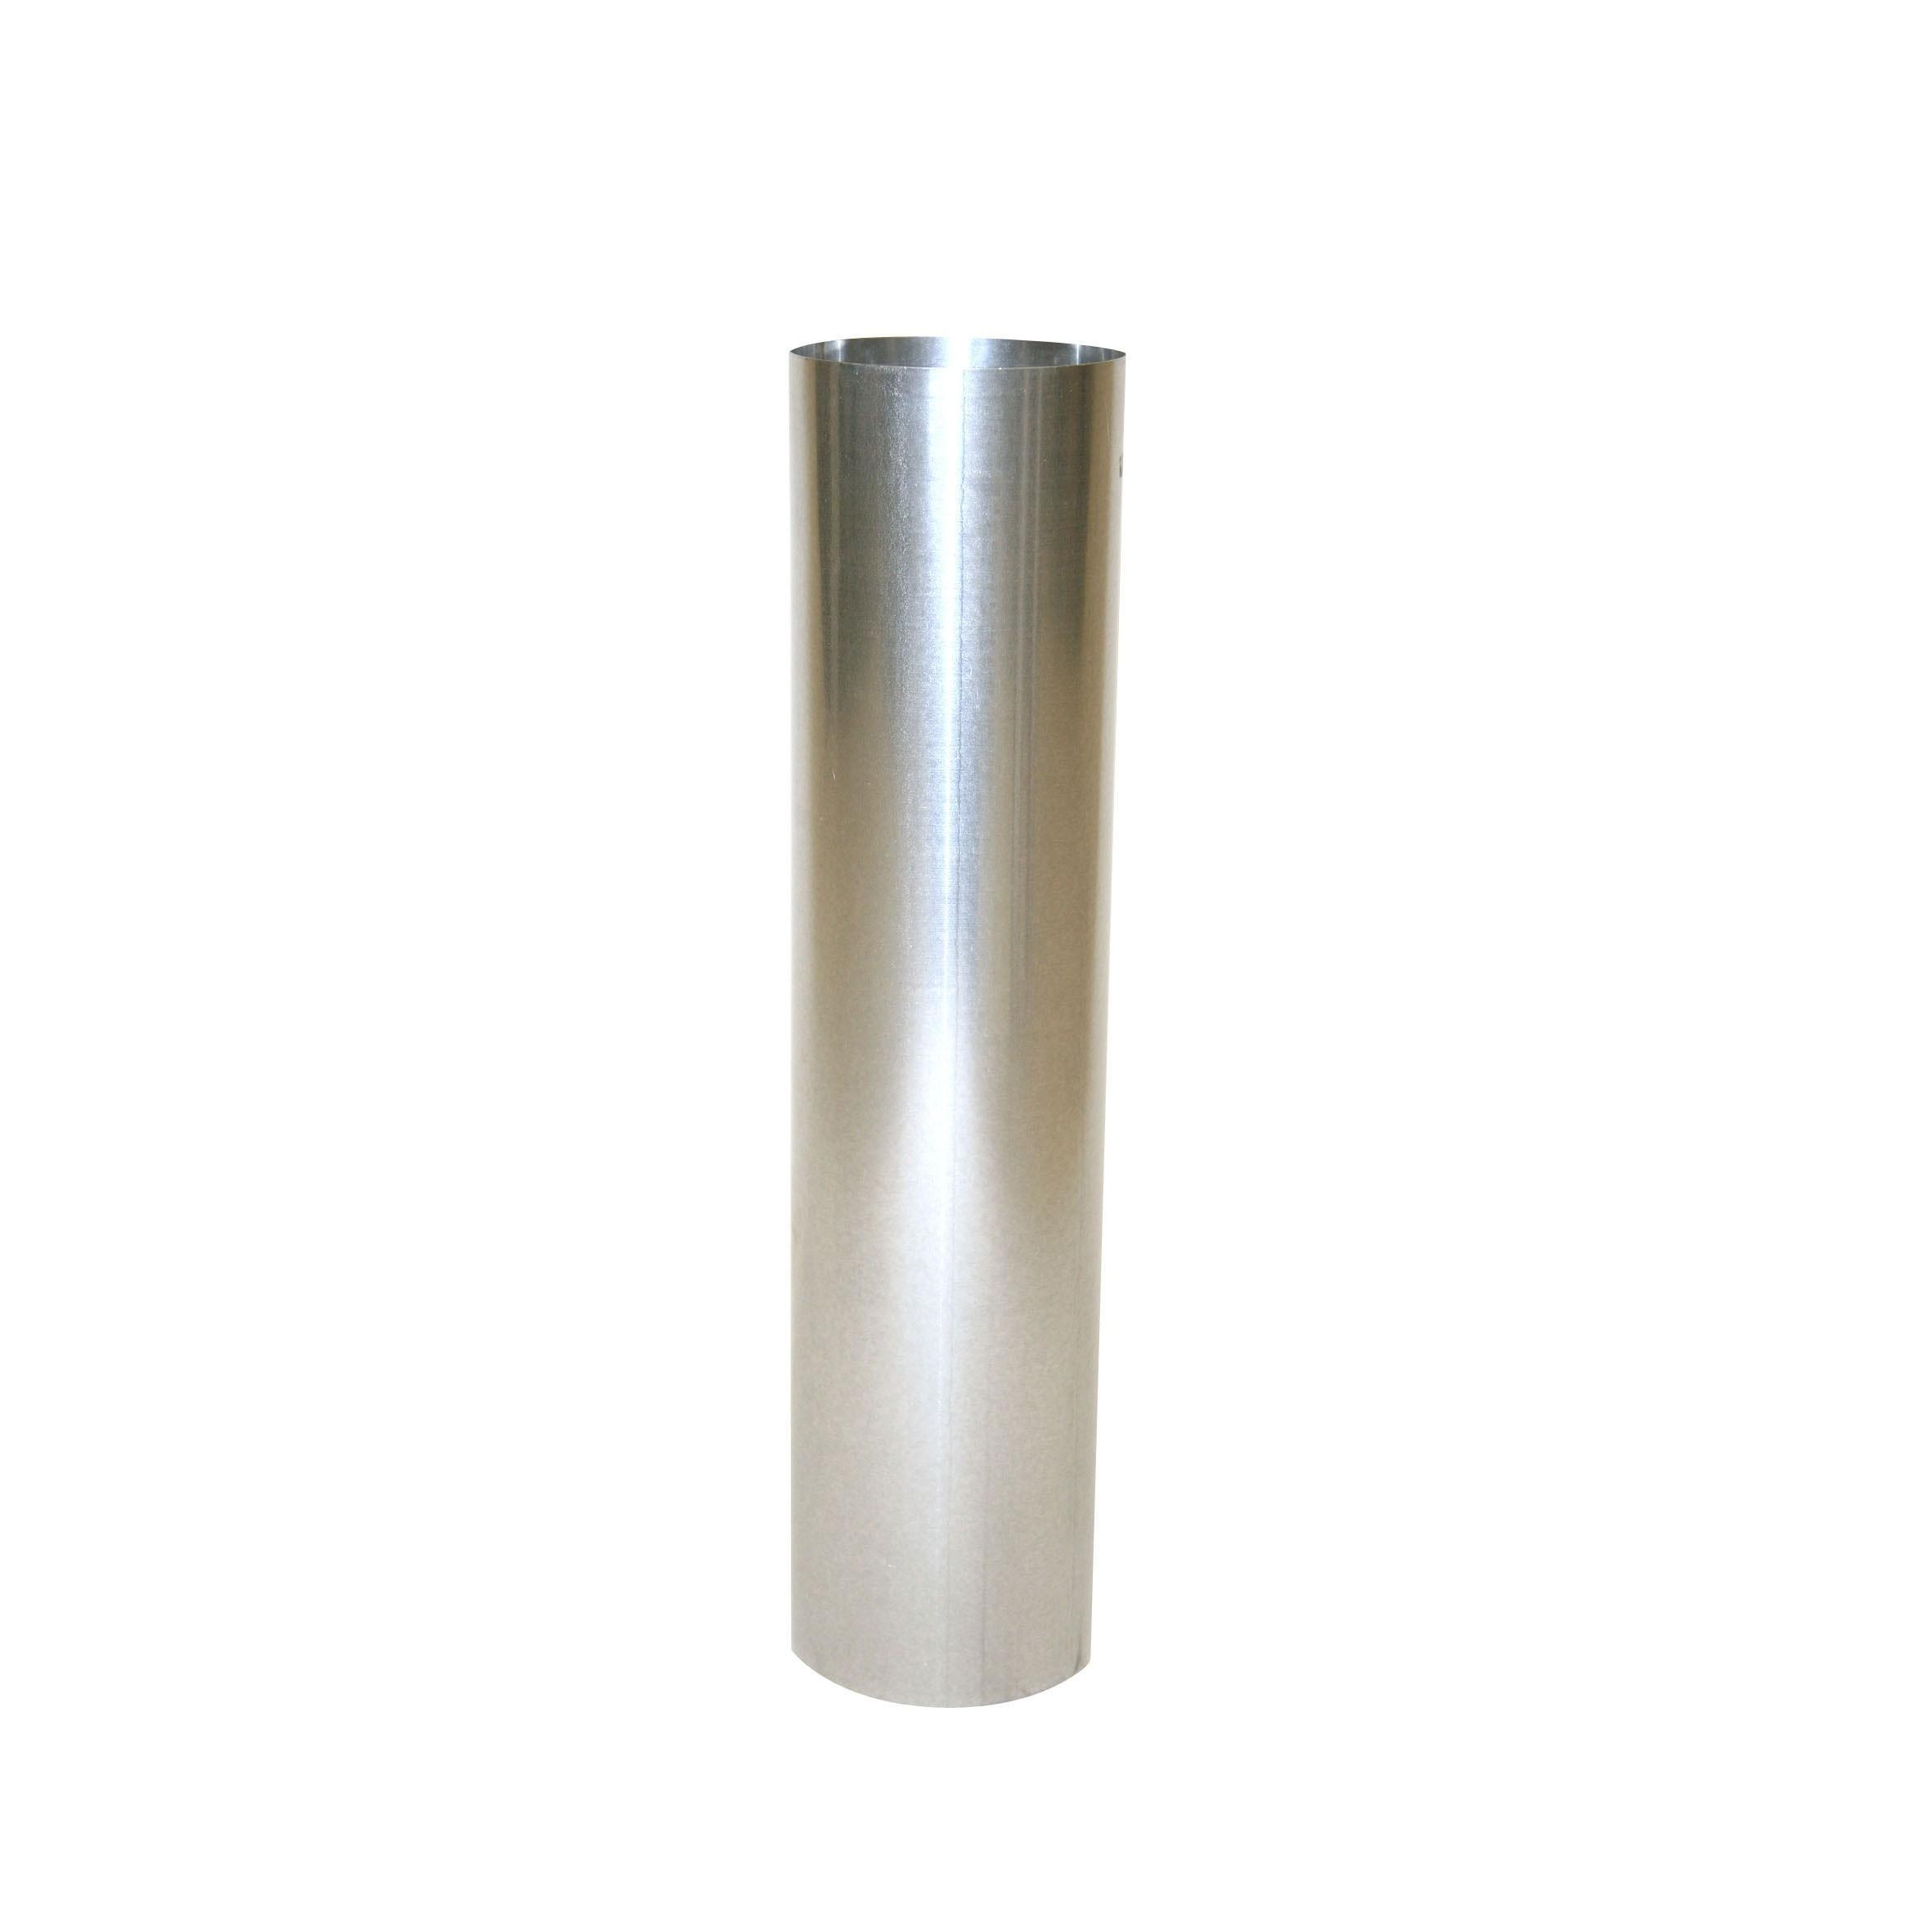 Ofenrohr / Rauchrohr KaminoFlam FAL Ø 150 mm Länge 500 mm Bild 1